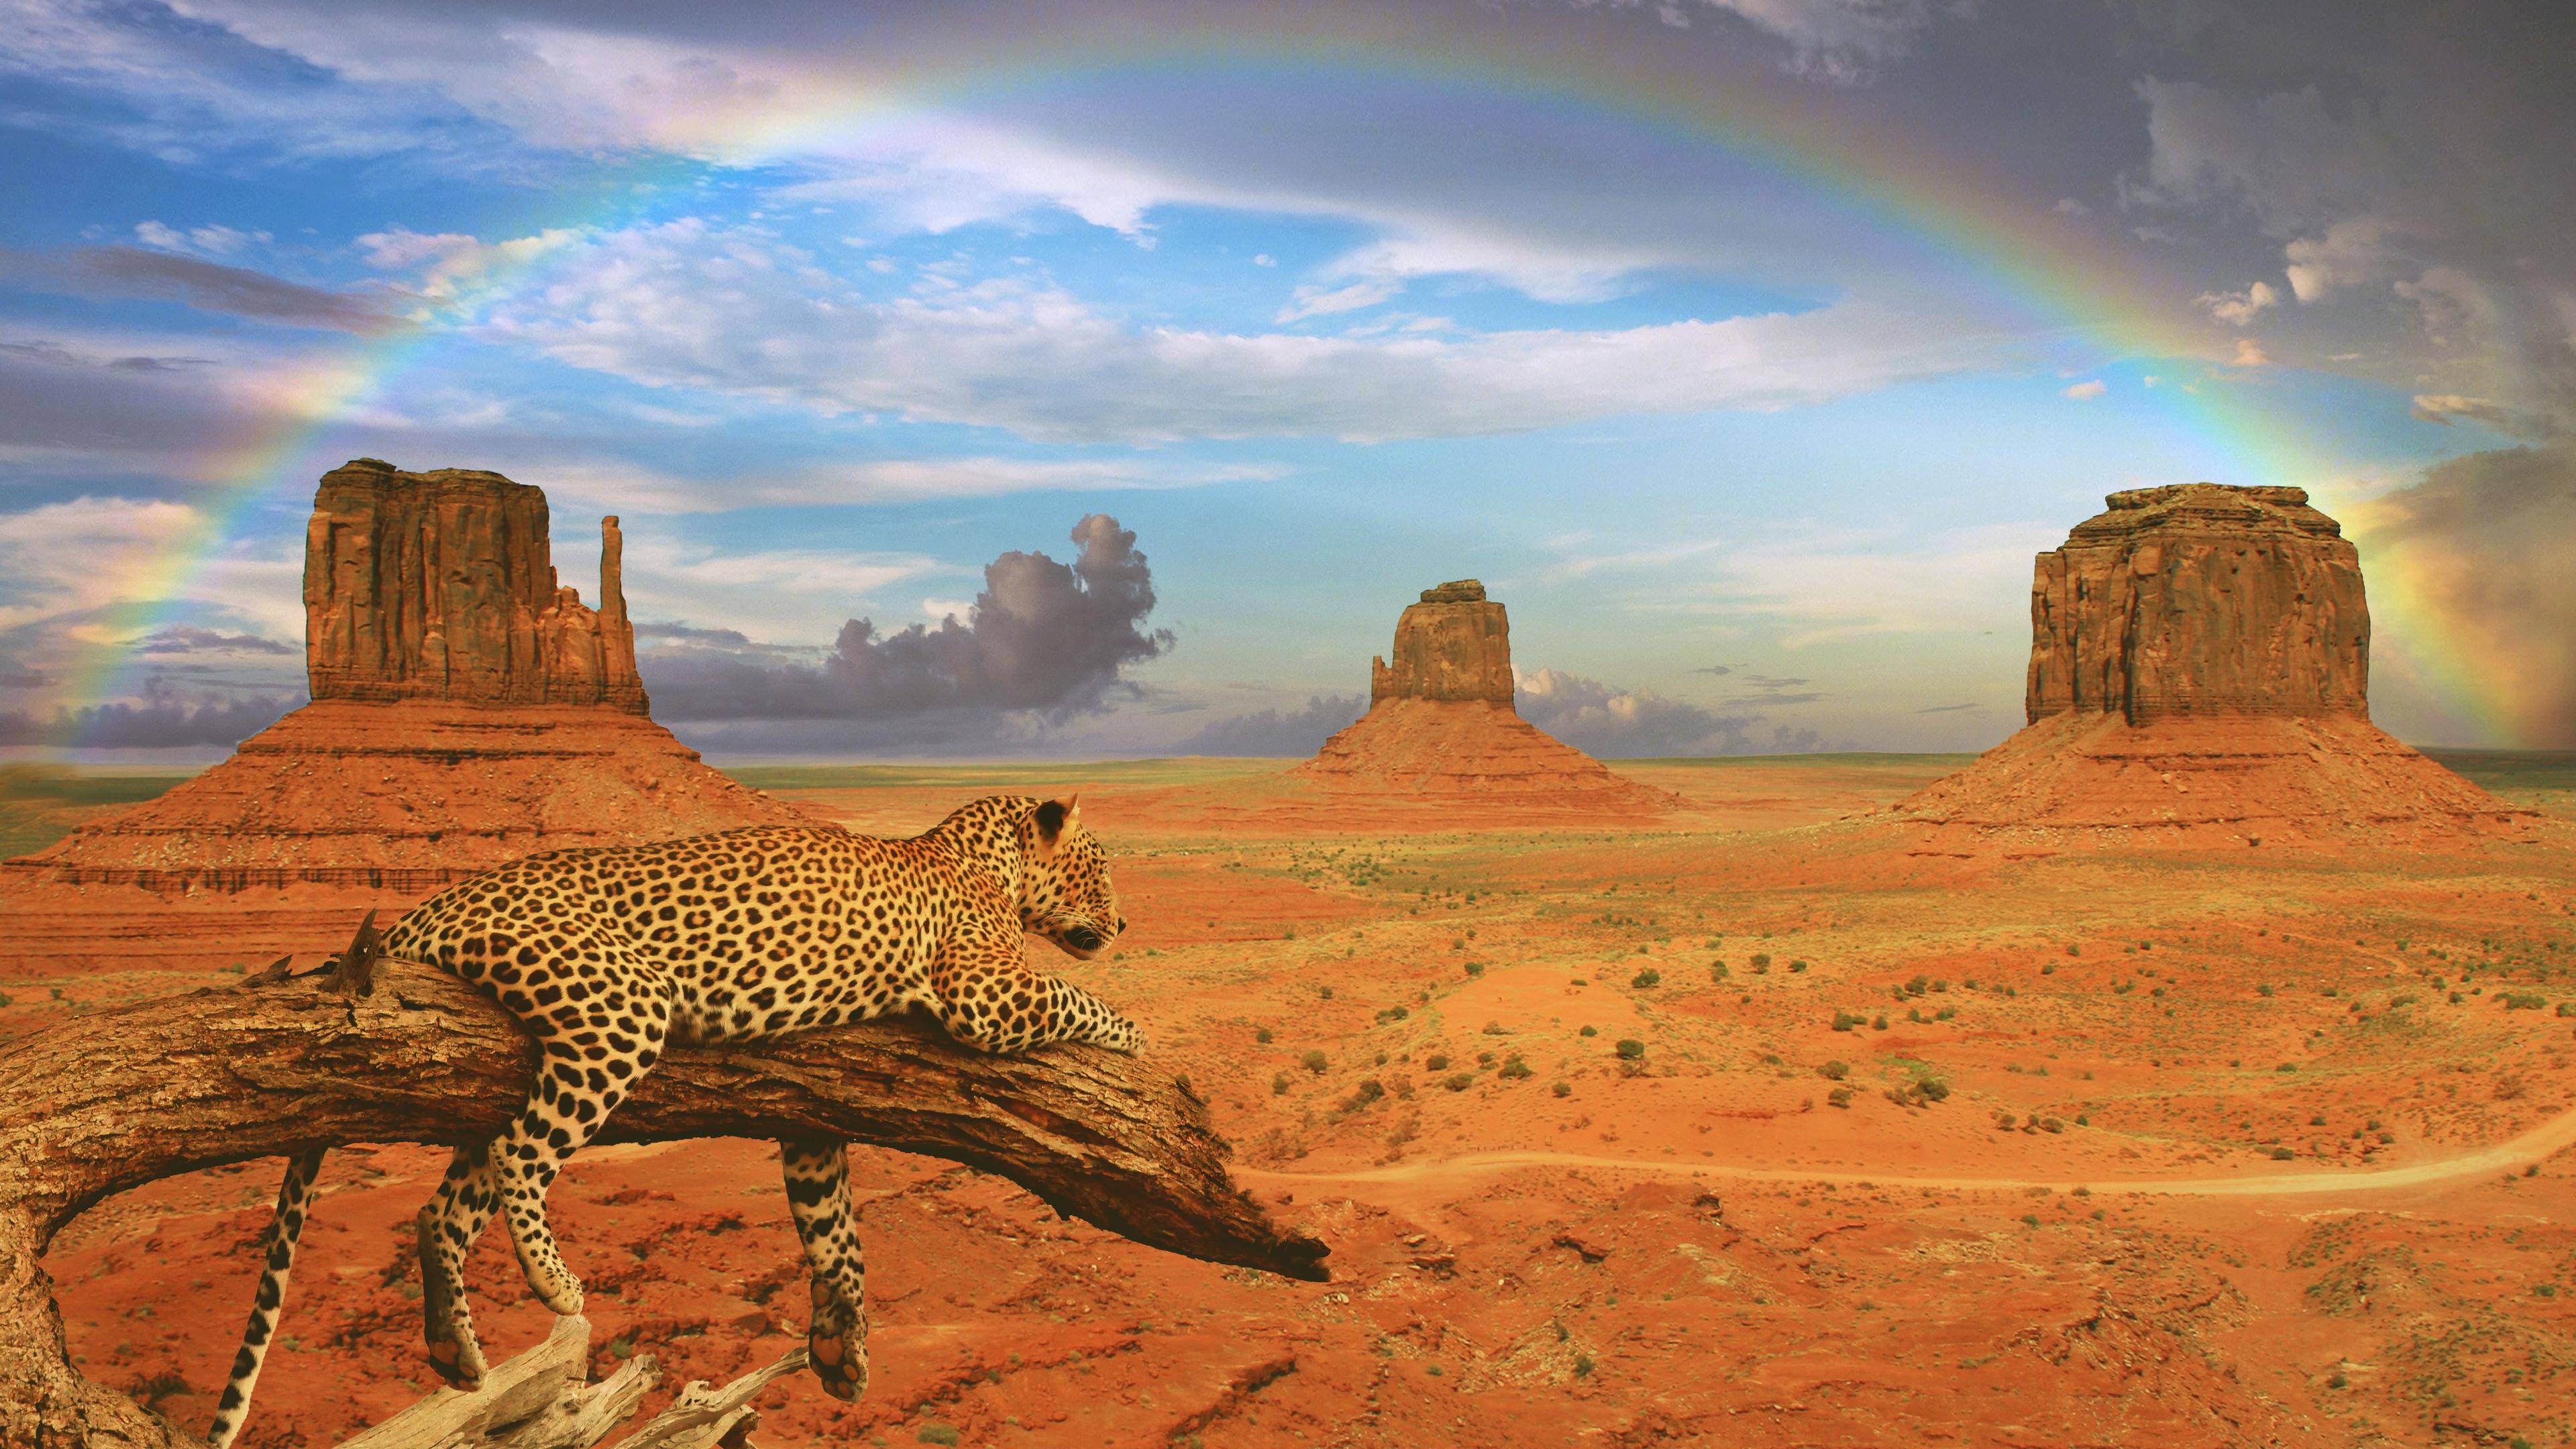 fantasy leopard rainbow 1542238773 - Fantasy Leopard Rainbow - rainbow wallpapers, leopard wallpapers, hd-wallpapers, fantasy wallpapers, animals wallpapers, 4k-wallpapers